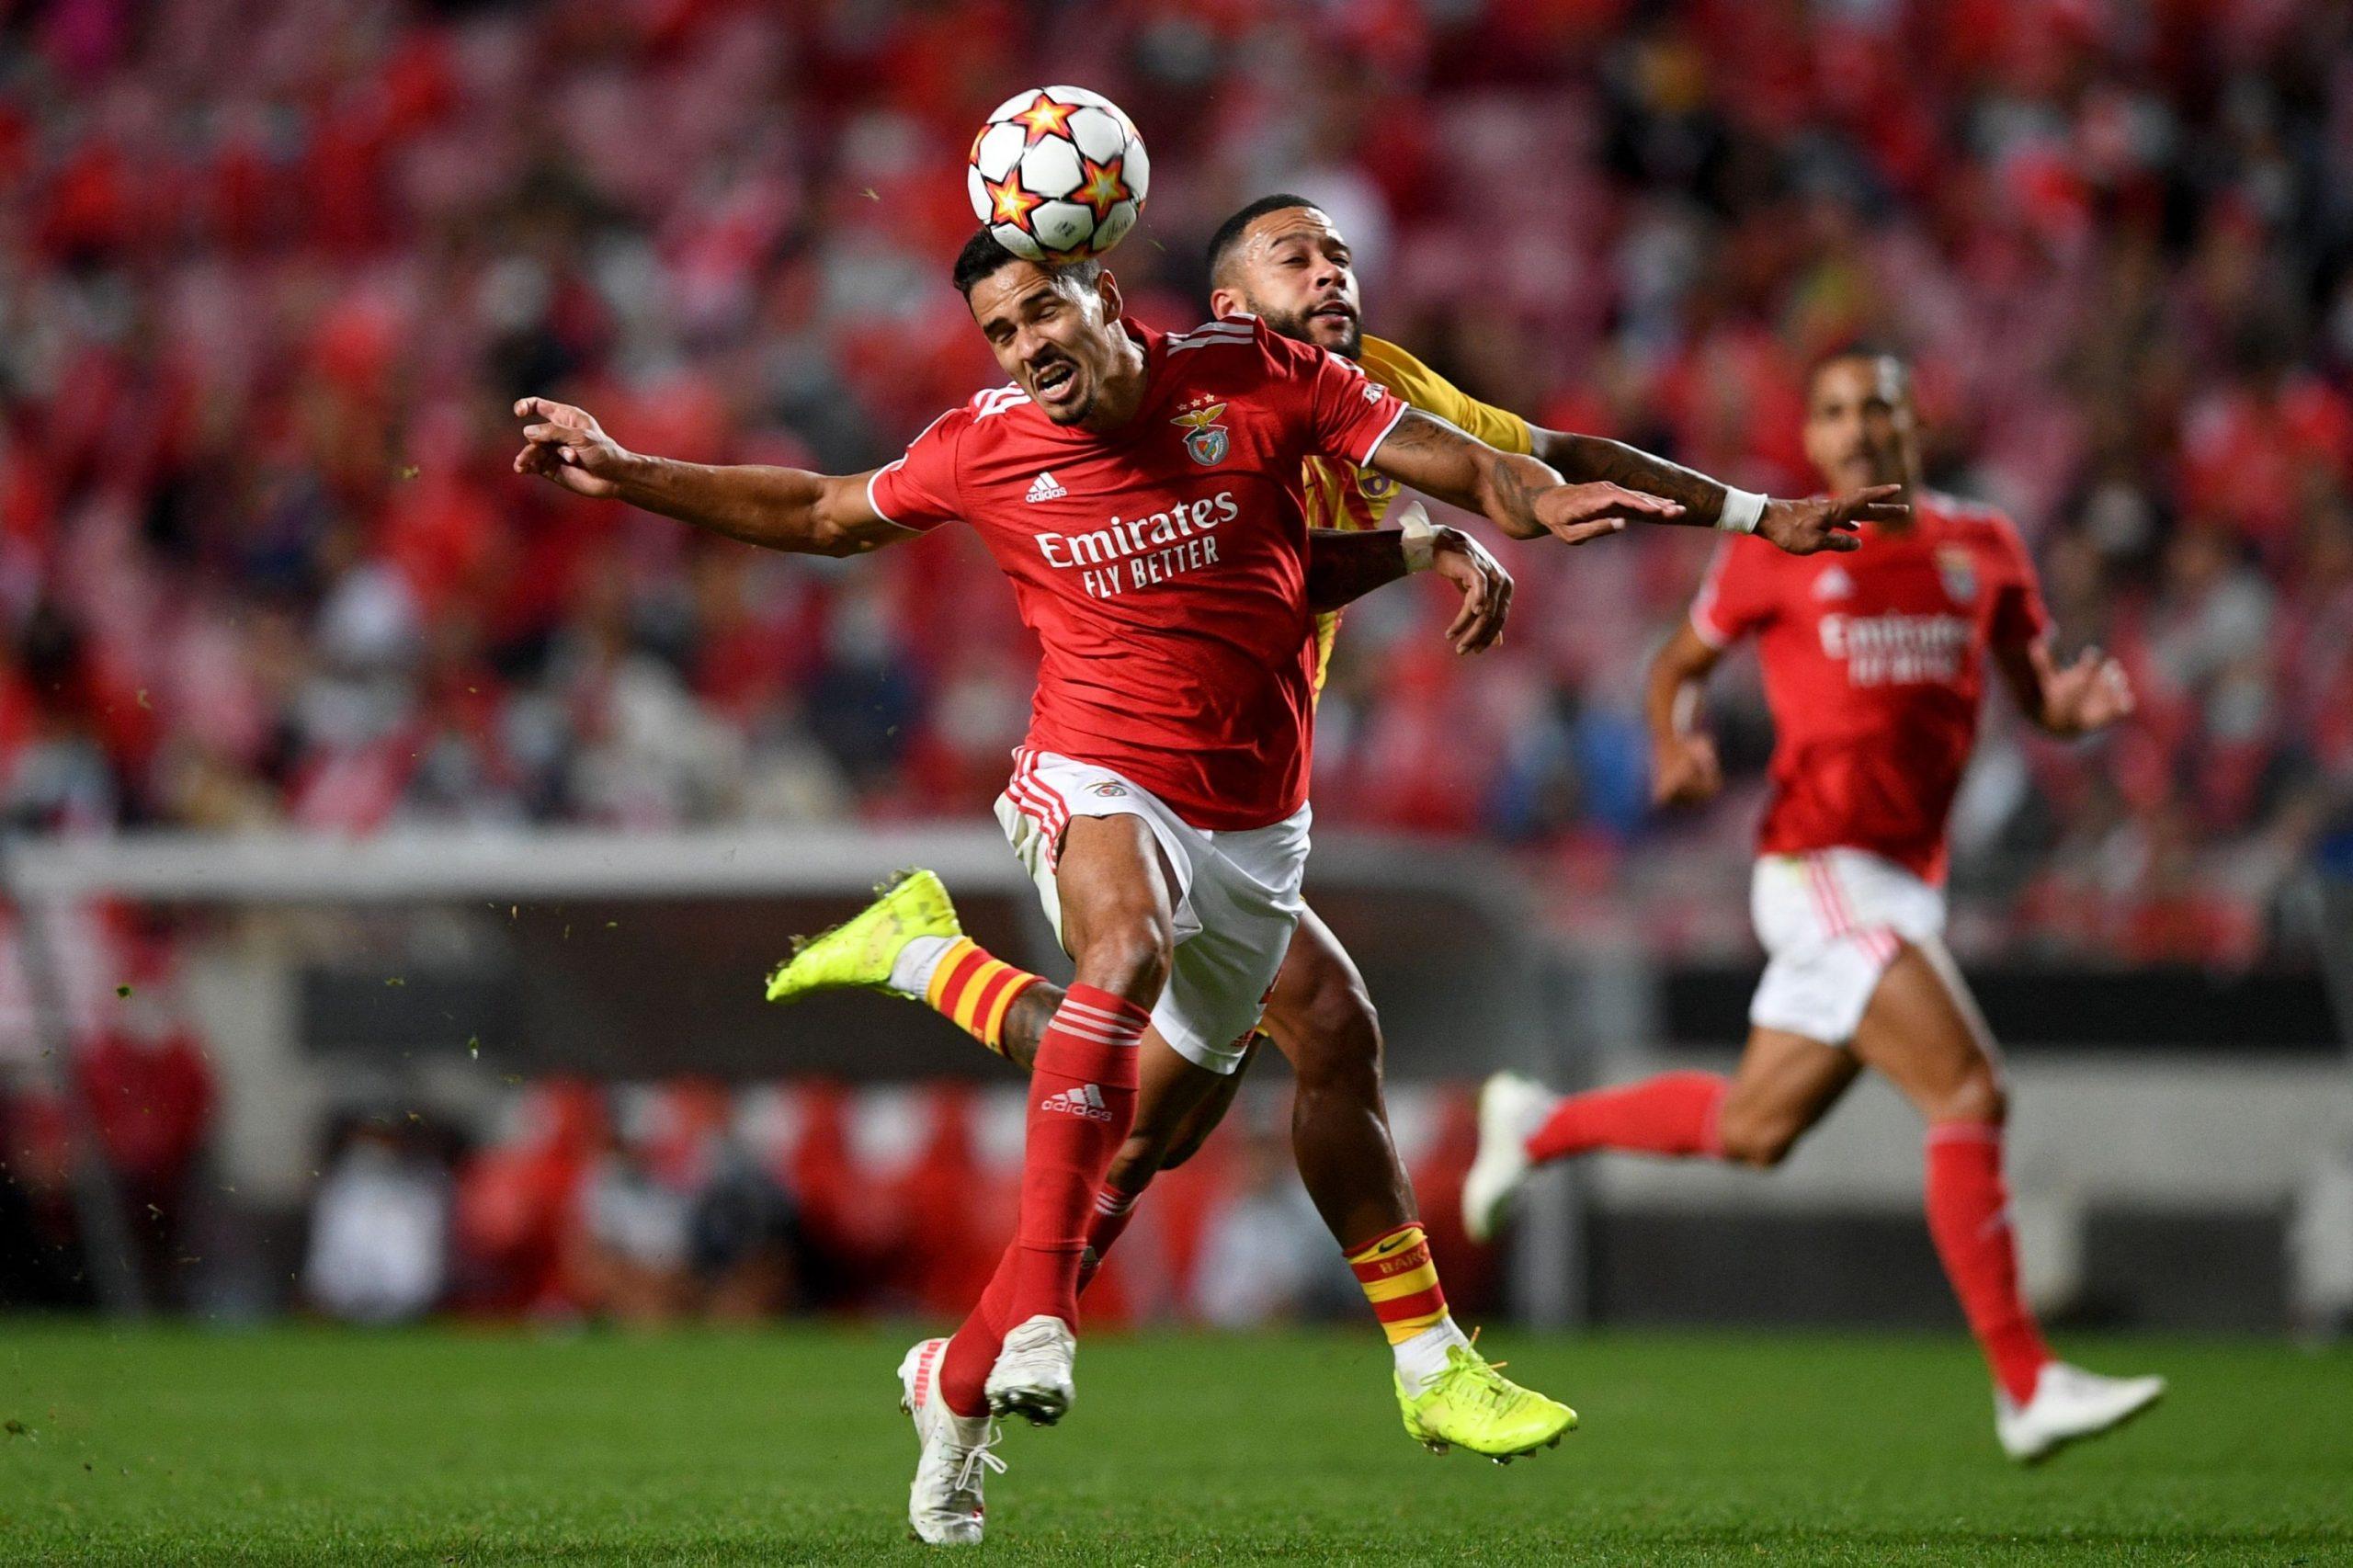 Dismal Barca battered by Benfica as pressure on Koeman mounts